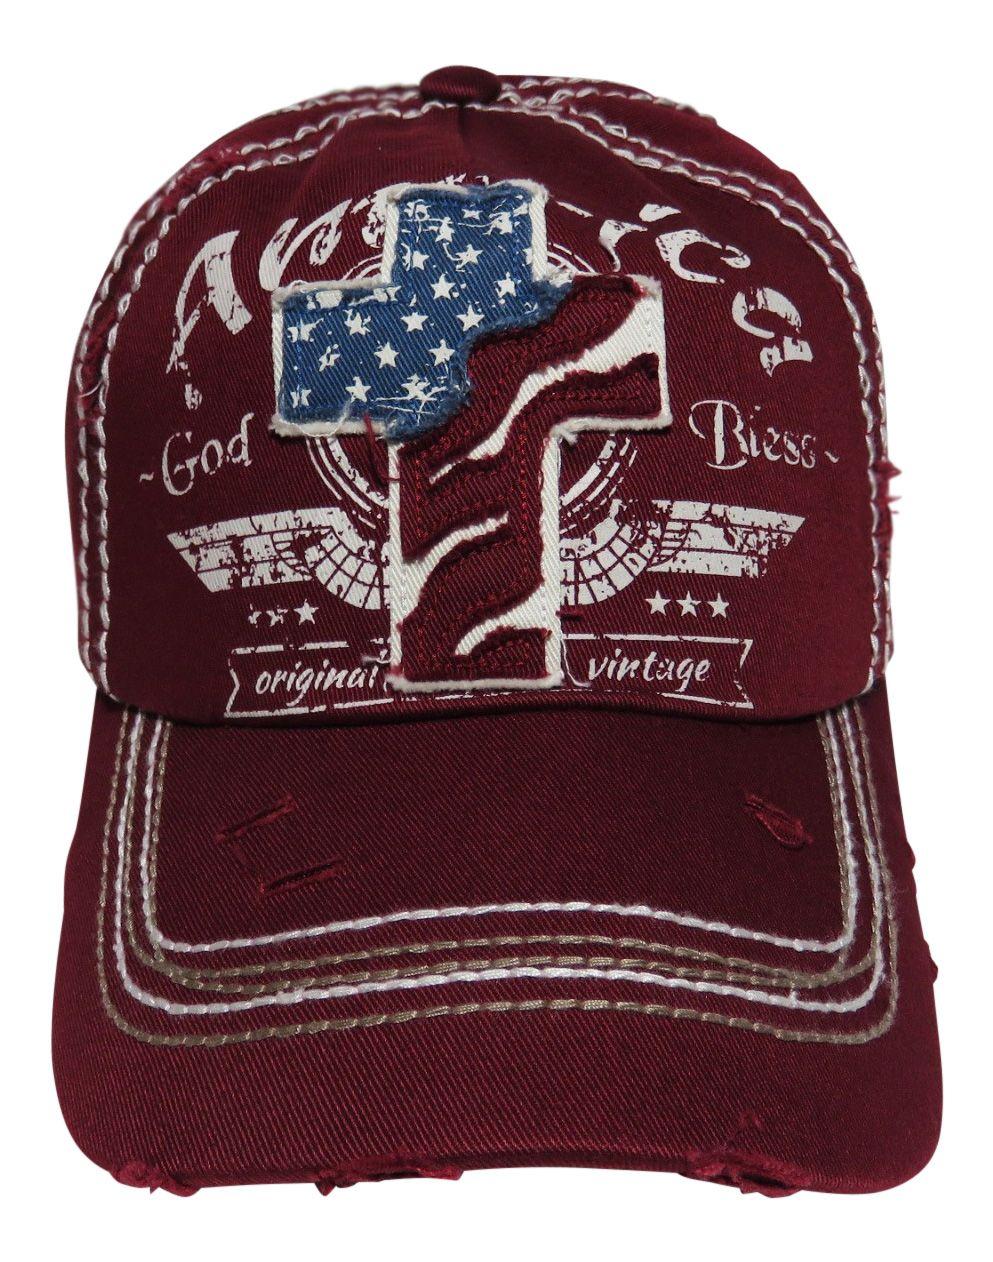 "NEW! ""God Bless America"" Cross Patch Burgundy Vintage Style Baseball Cap! Order at www.shopspiritcaps.com!"